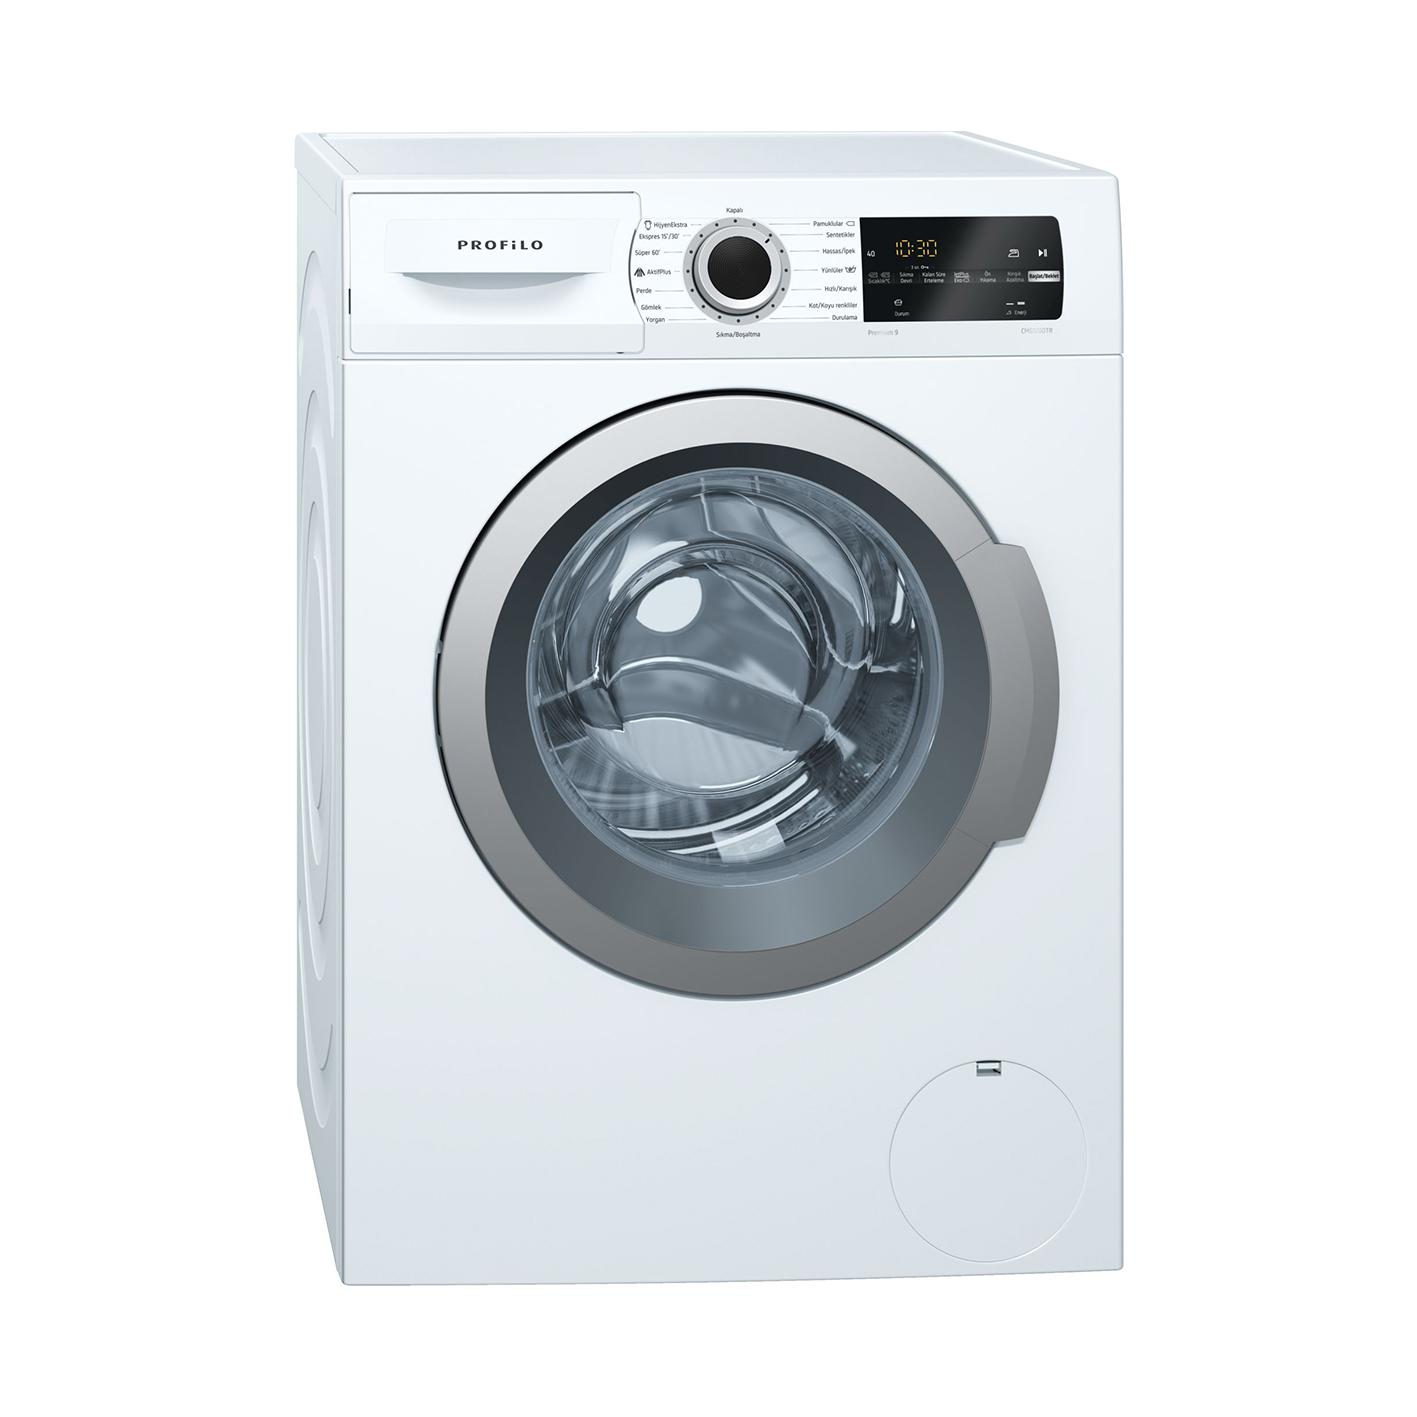 Profilo CMG120DTR Çamaşır Makinesi